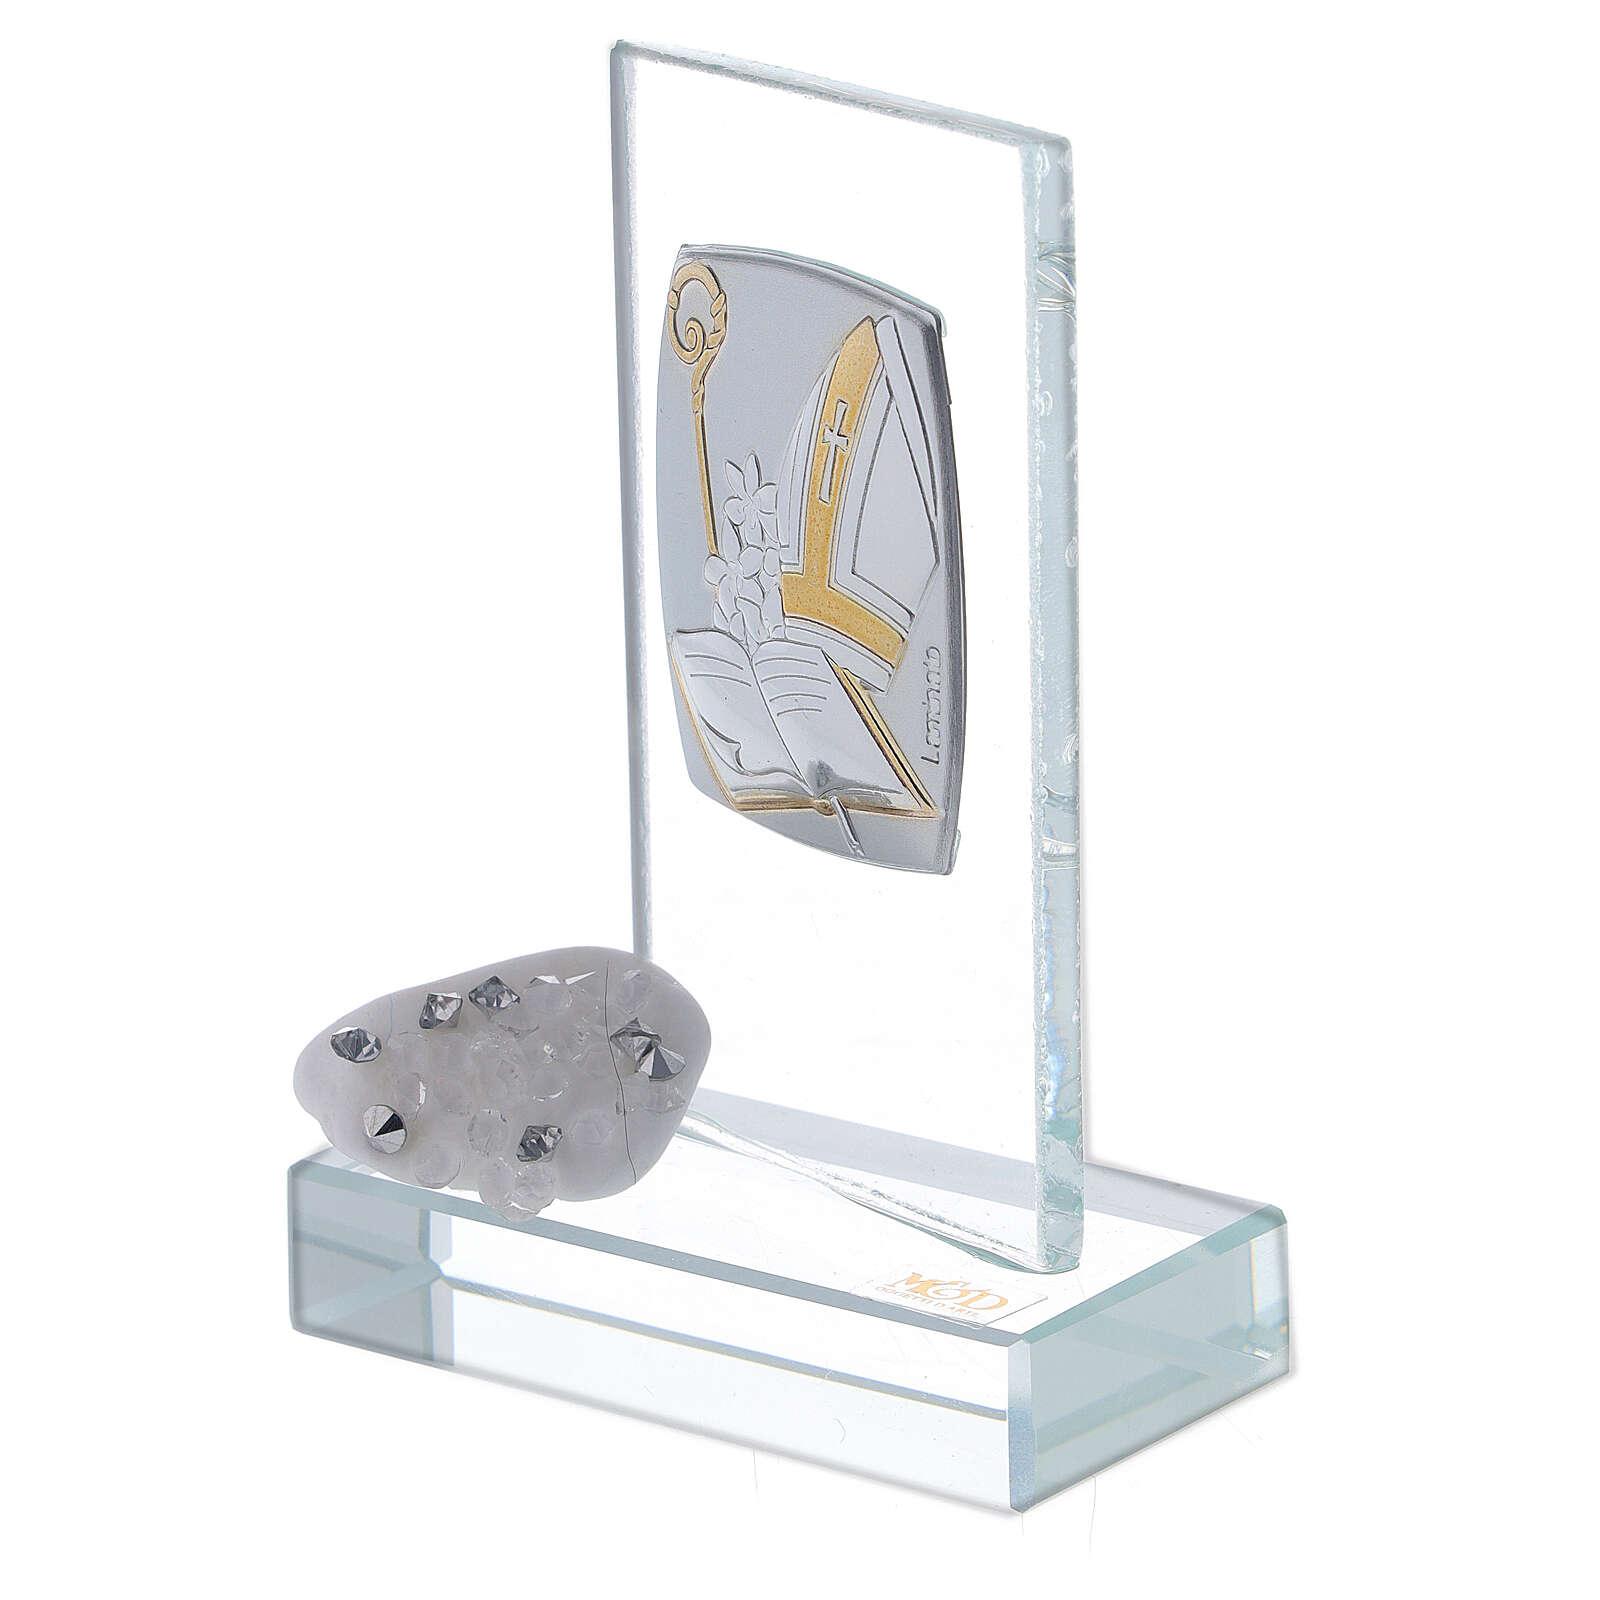 Bomboniera simboli Cresima in vetro 3